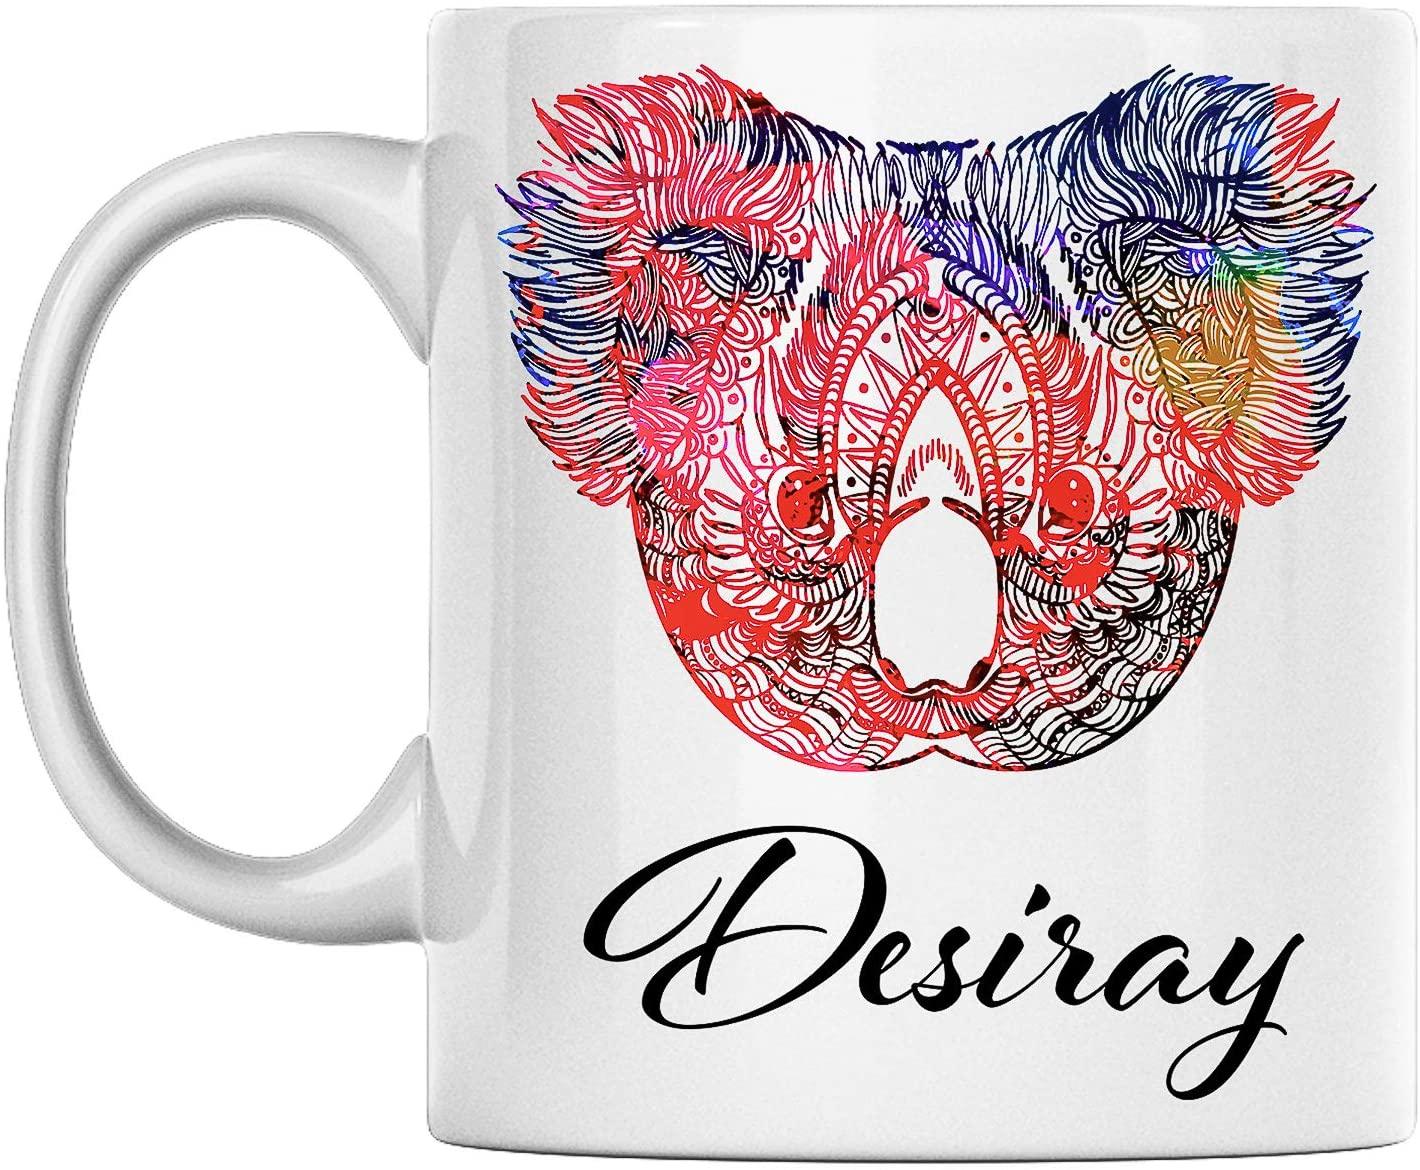 Personal Koala Mug Name Desiray White Ceramic 11 Oz Coffee Mug Printed on Both Sides Perfect for Birthday For Him, Her, Boy, Girl, Husband, Wife, Men, and Women